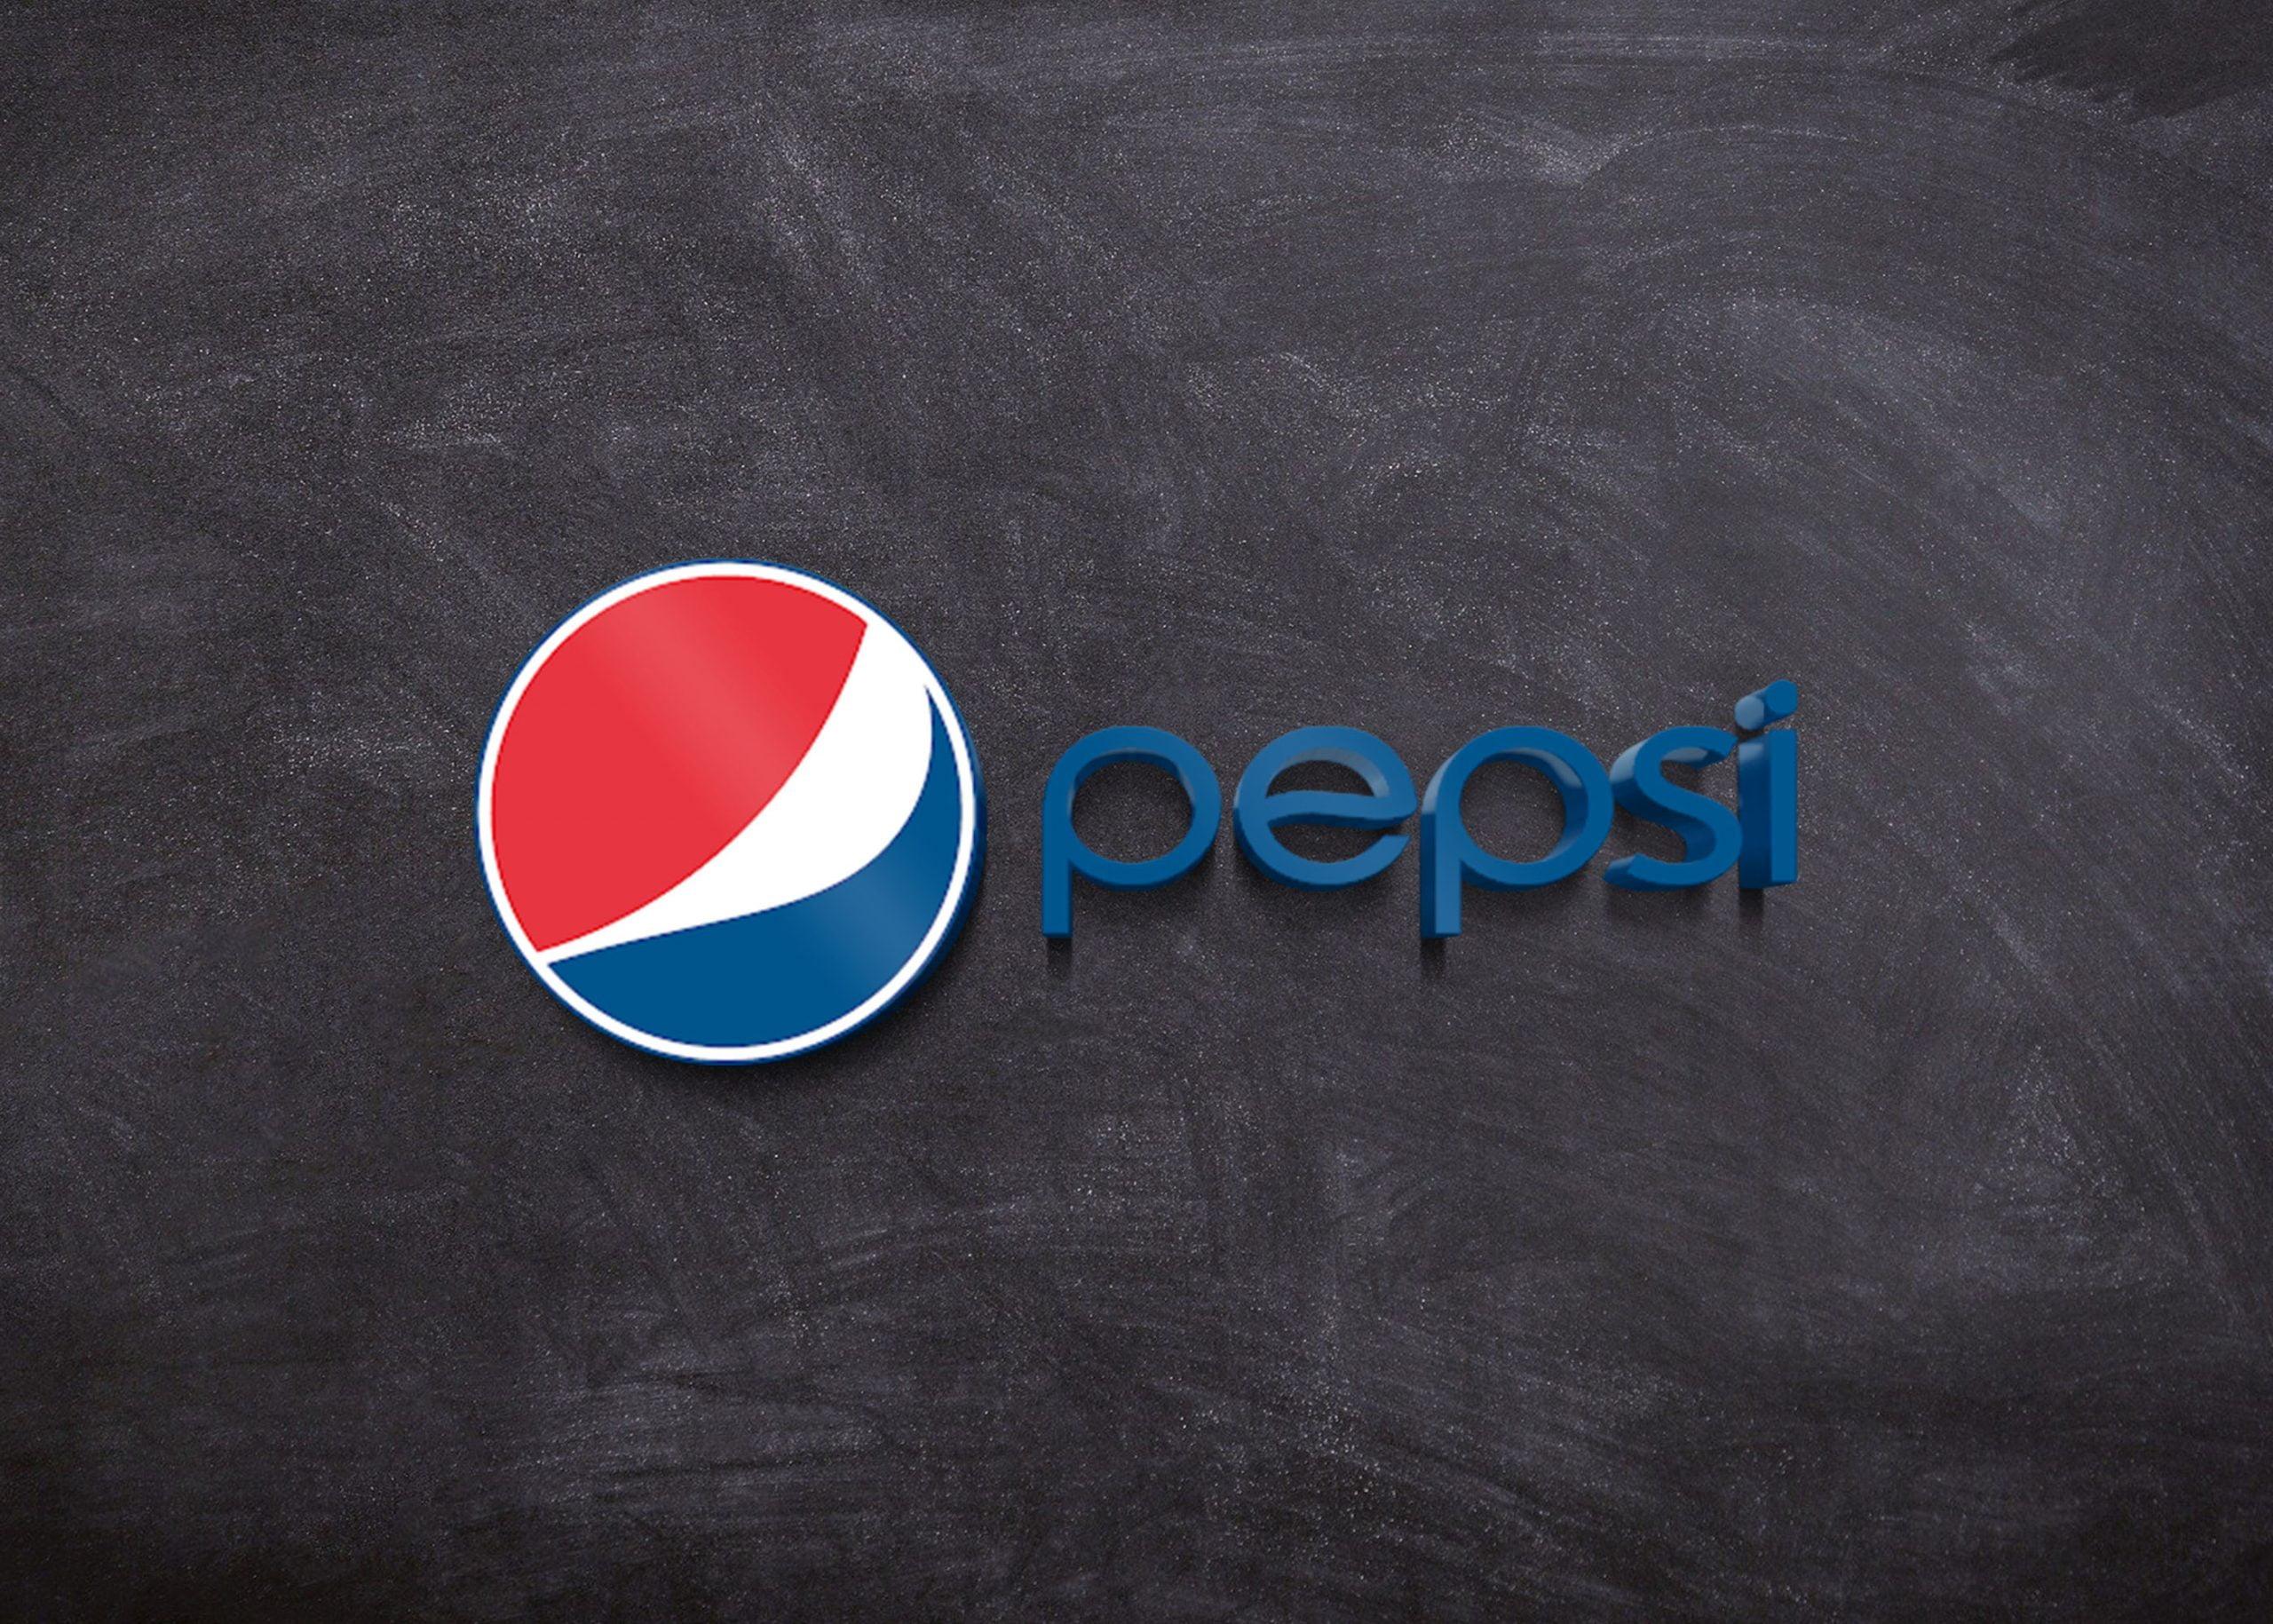 Pepsi on 3d wall mockup